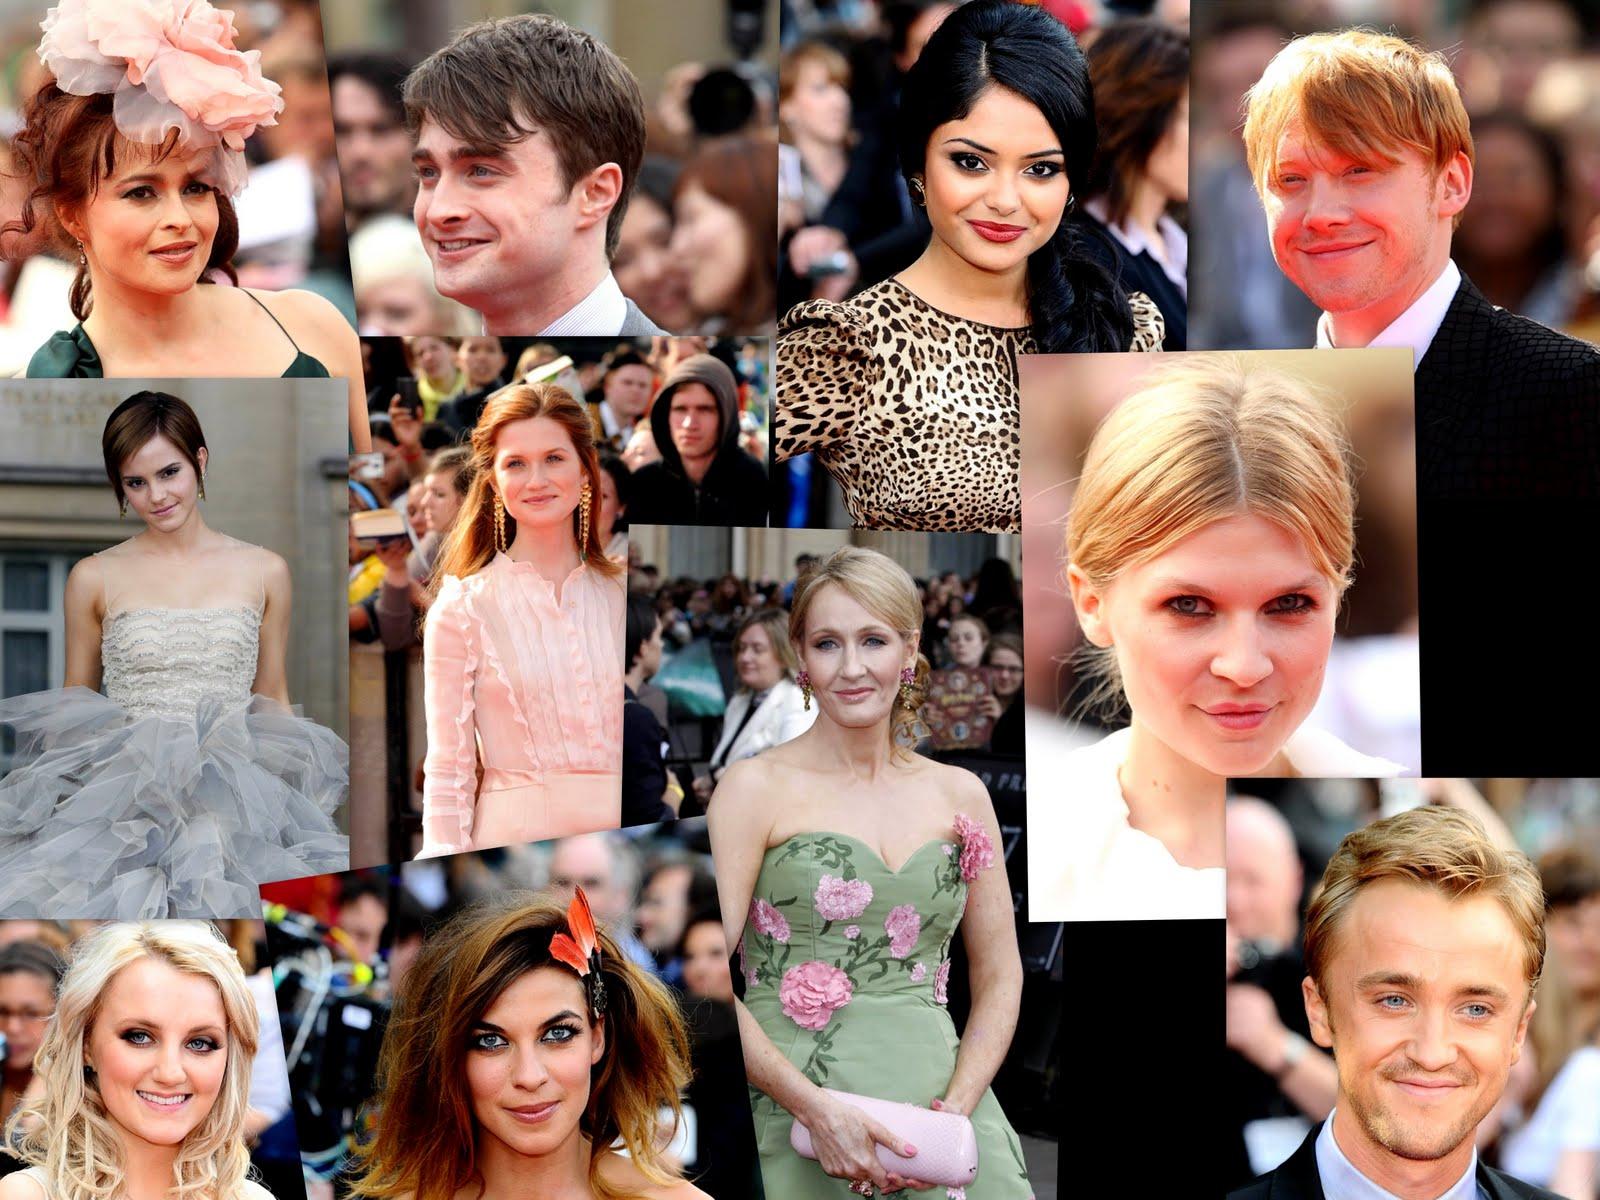 http://3.bp.blogspot.com/-MG4Gpsyg8Ew/ThdXkFNm1FI/AAAAAAAABOA/Tp1Tcv28qZQ/s1600/Harry+Potter.jpg